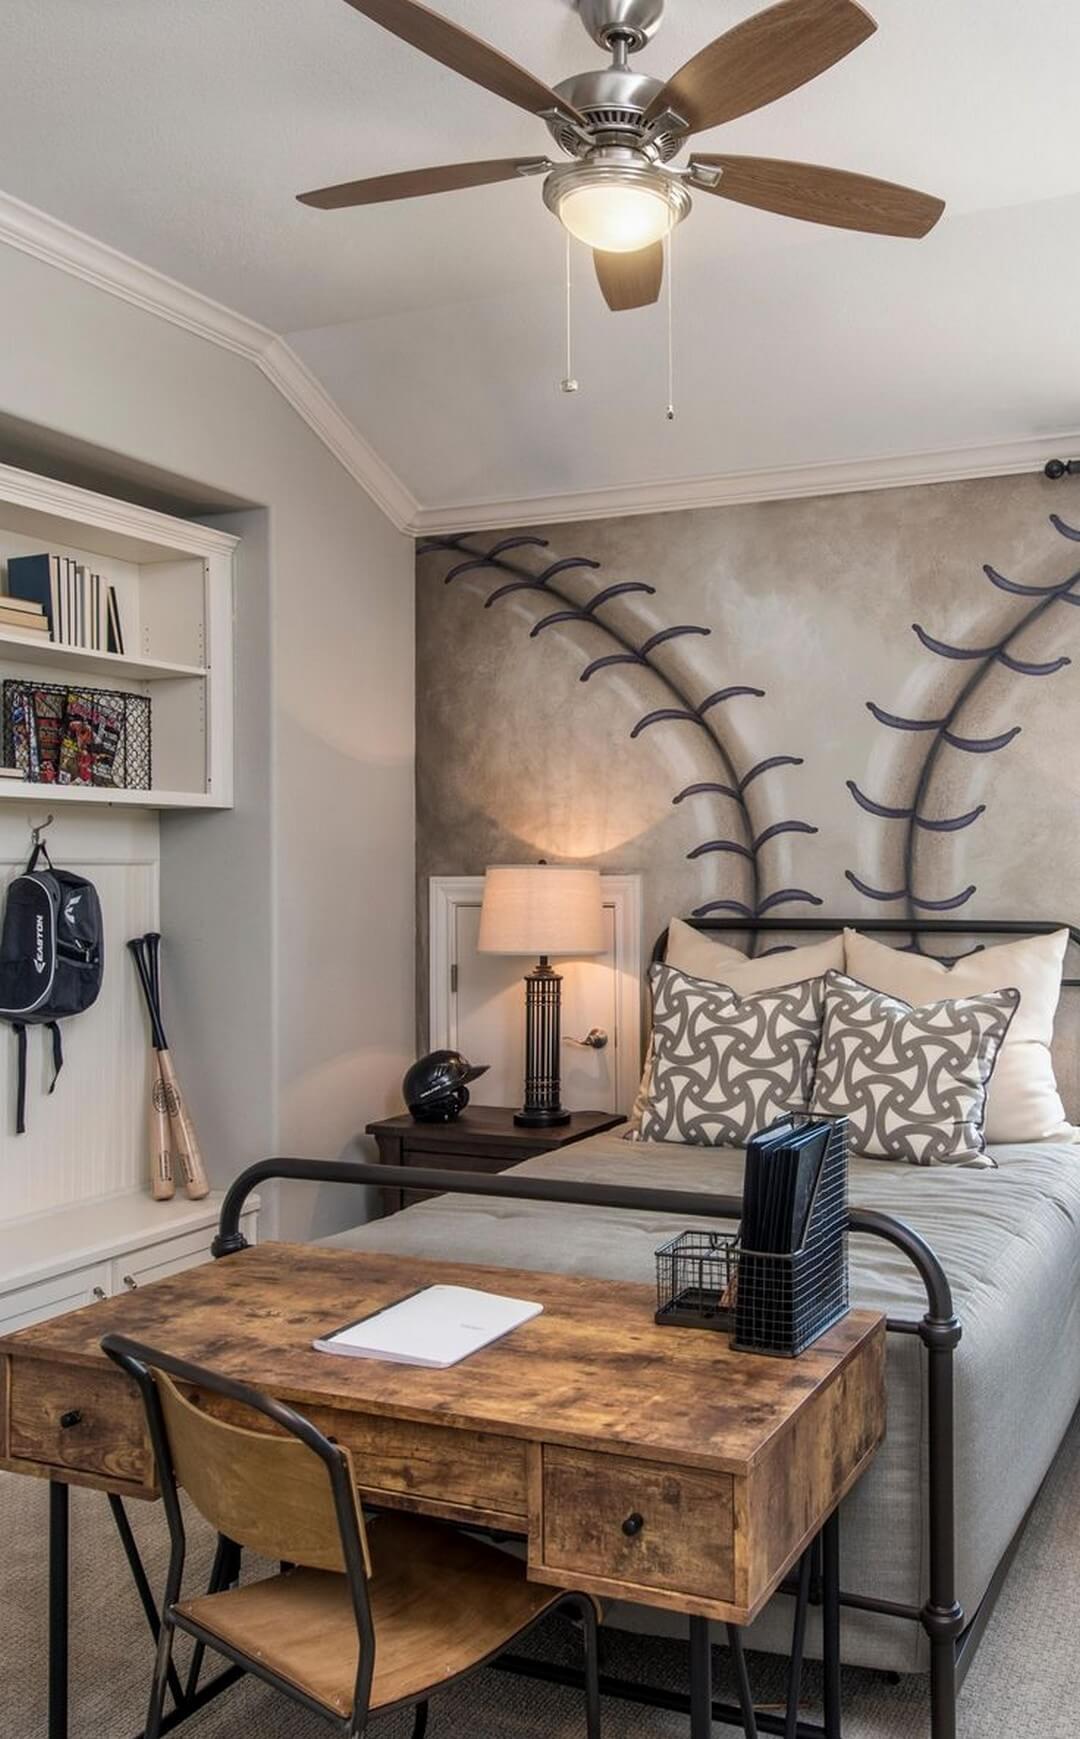 Teenage Living Room Ideas 24-teenage-boy-room-decor-ideas-homebnc — homebnc